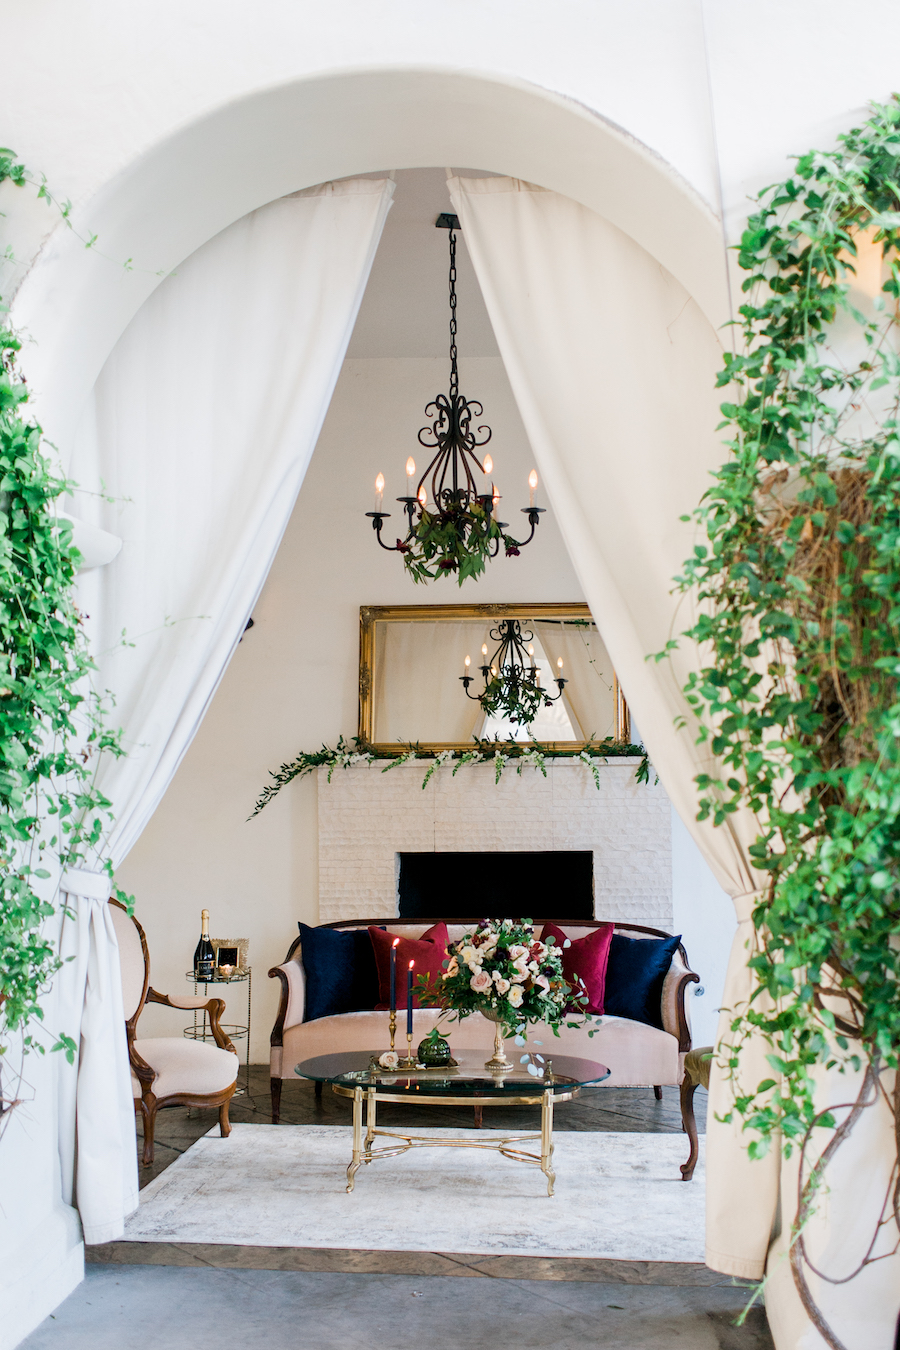 burlap-and-bordeux-steven-leyva-photography-villa-and-vine-wedding-styled-shoot6.jpg